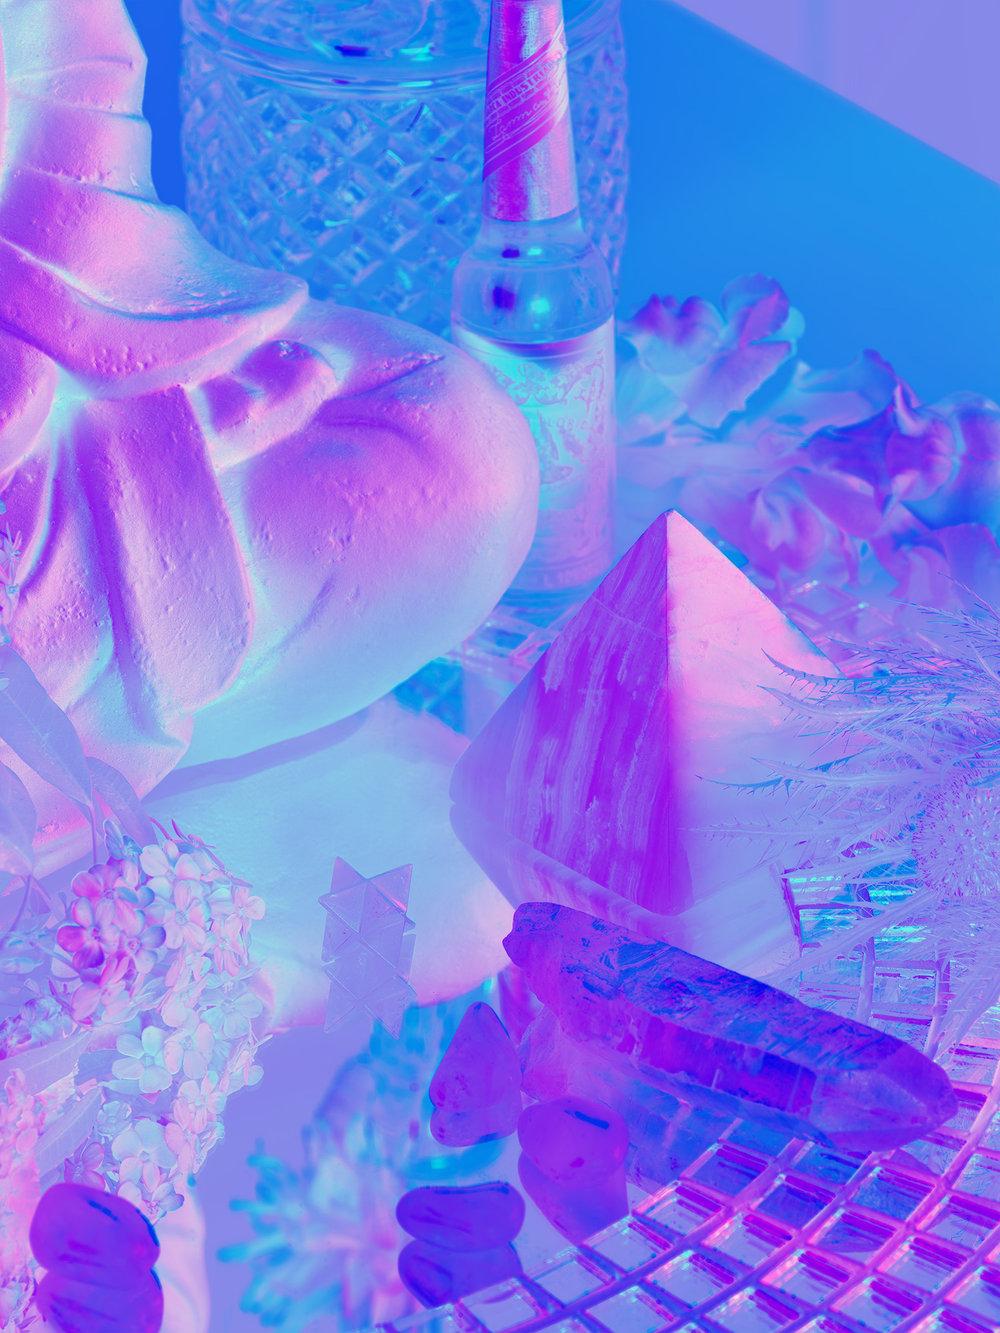 15.10.05_Image_002.jpg